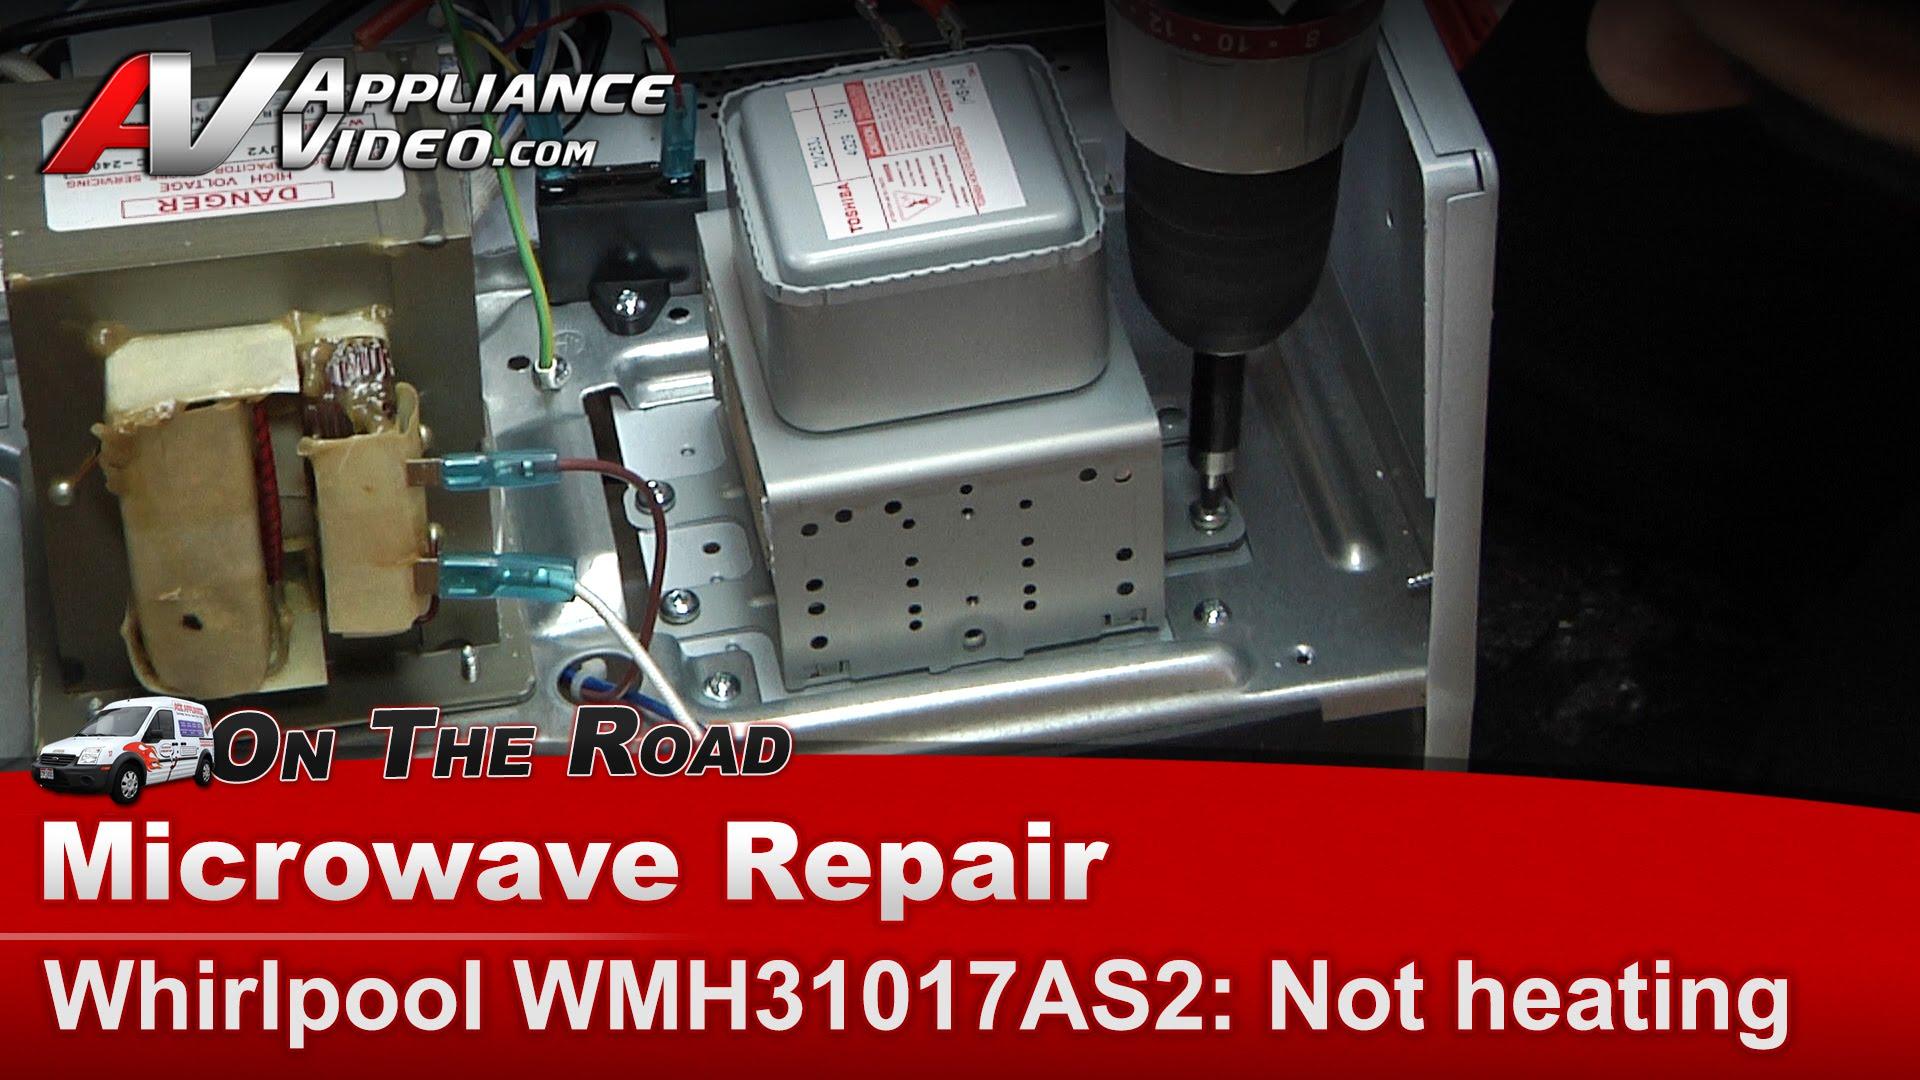 rv solar videx wiring diagram whirlpool wmh31017as2 microwave repair – not heating ...